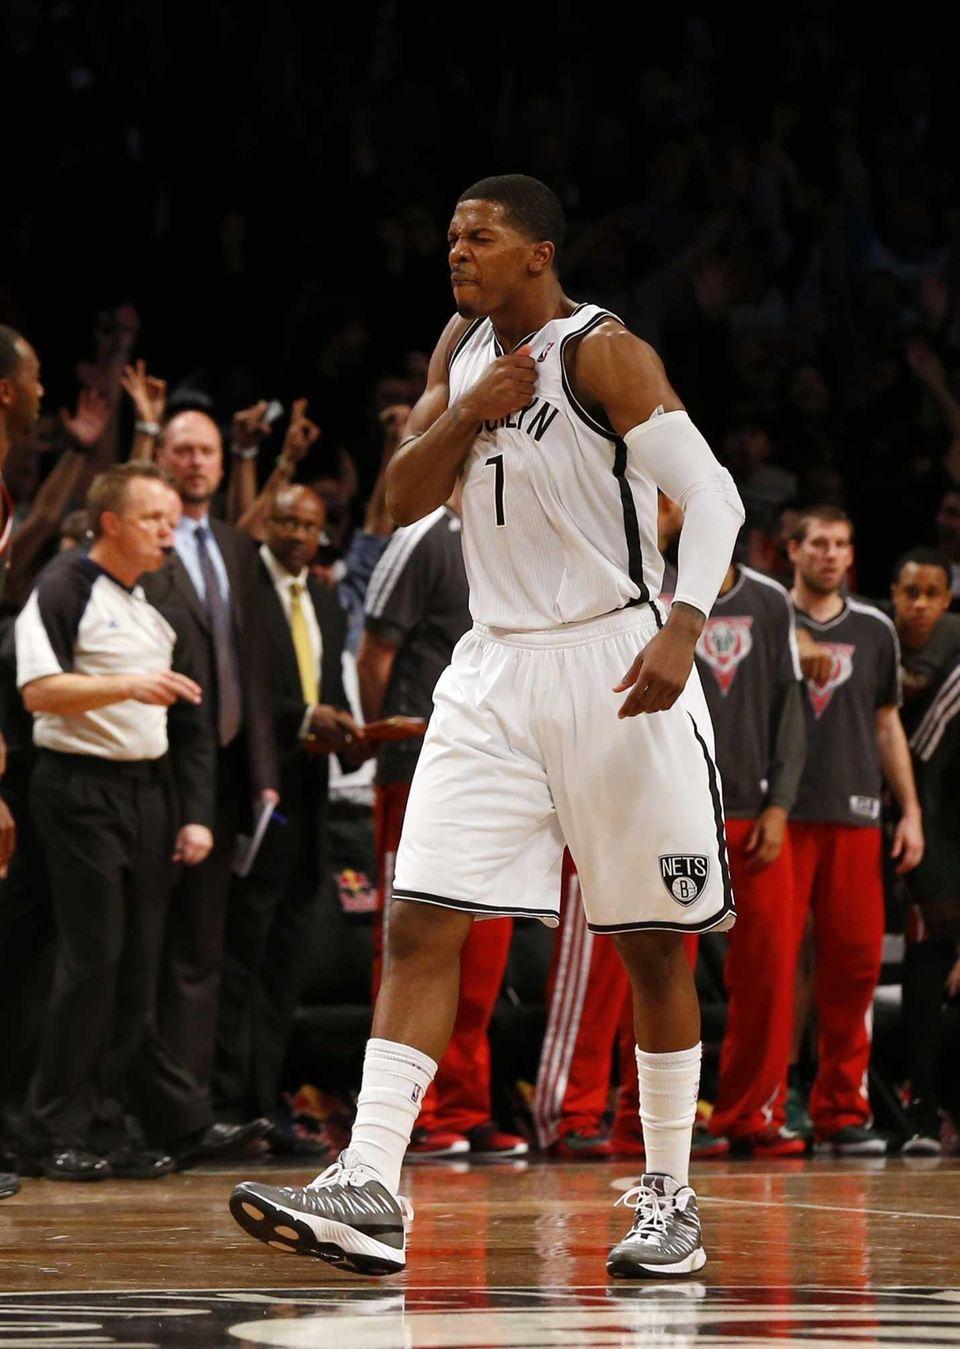 Joe Johnson of the Brooklyn Nets celebrates his